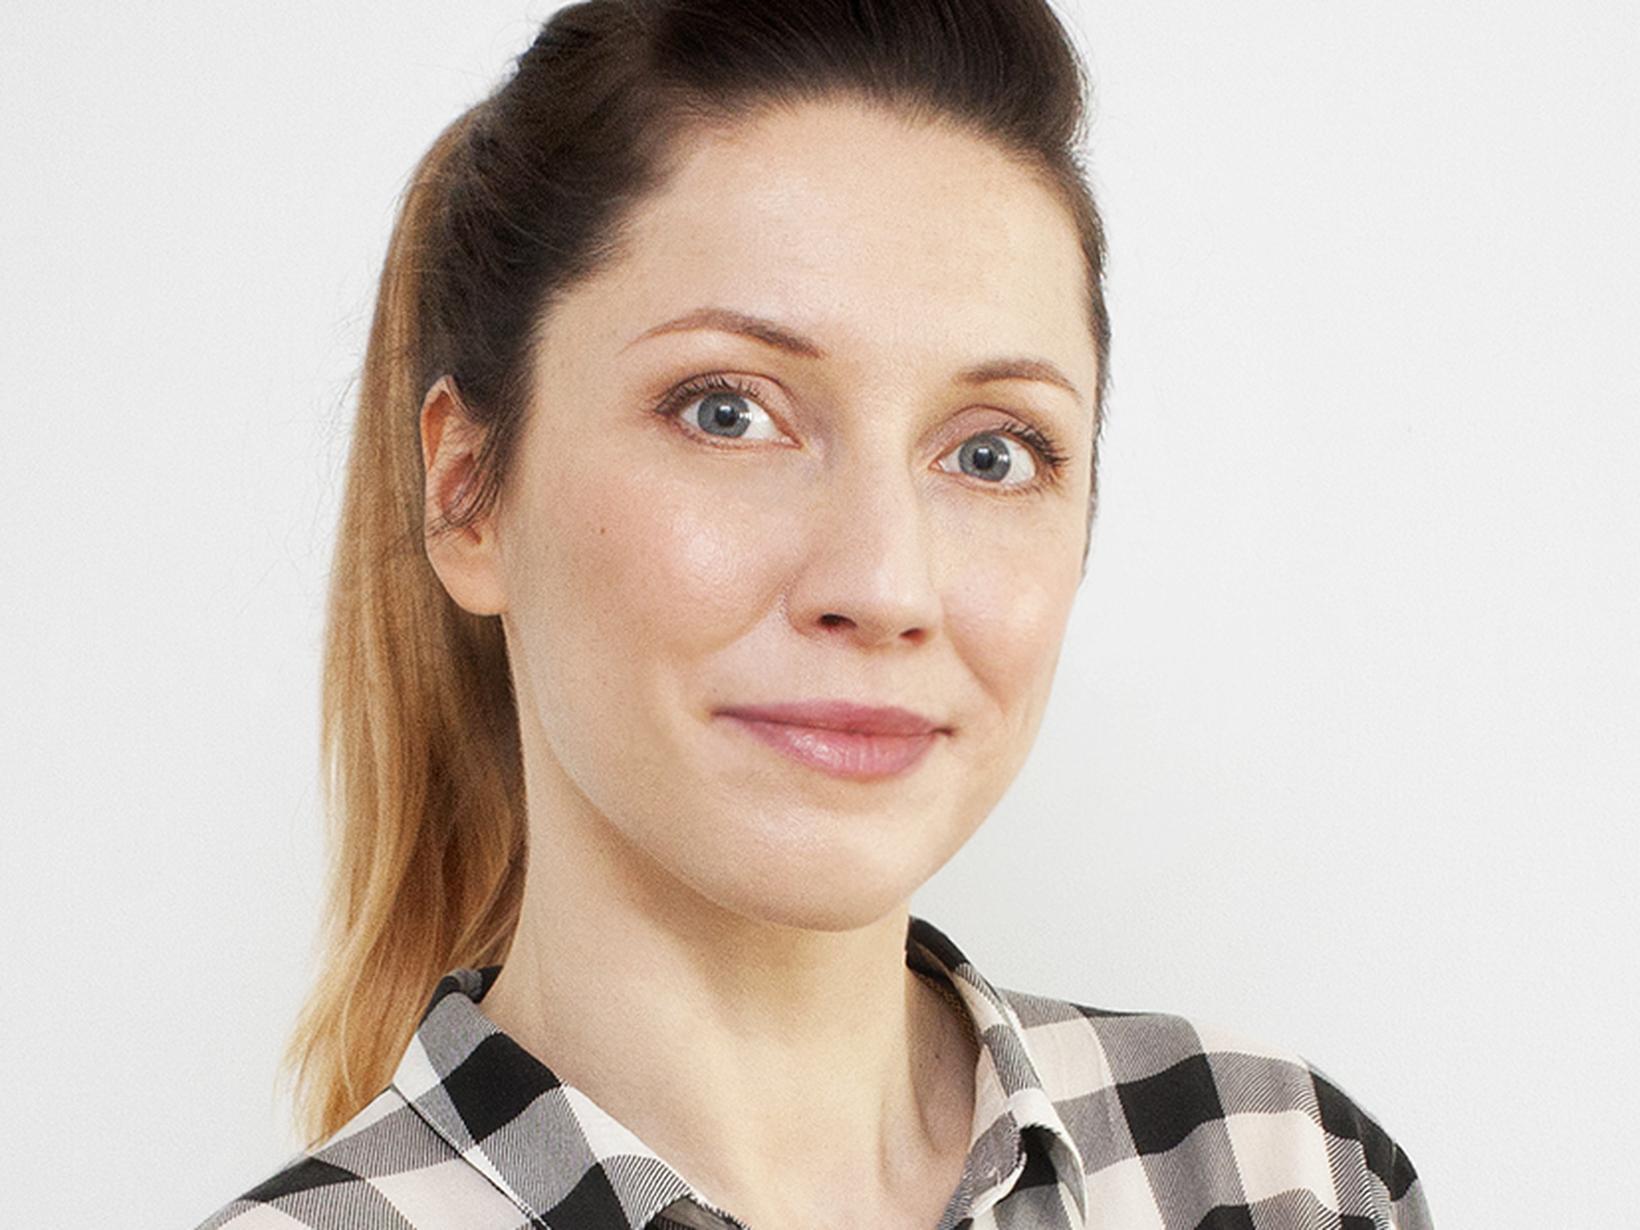 Barbara from Wrocław, Poland